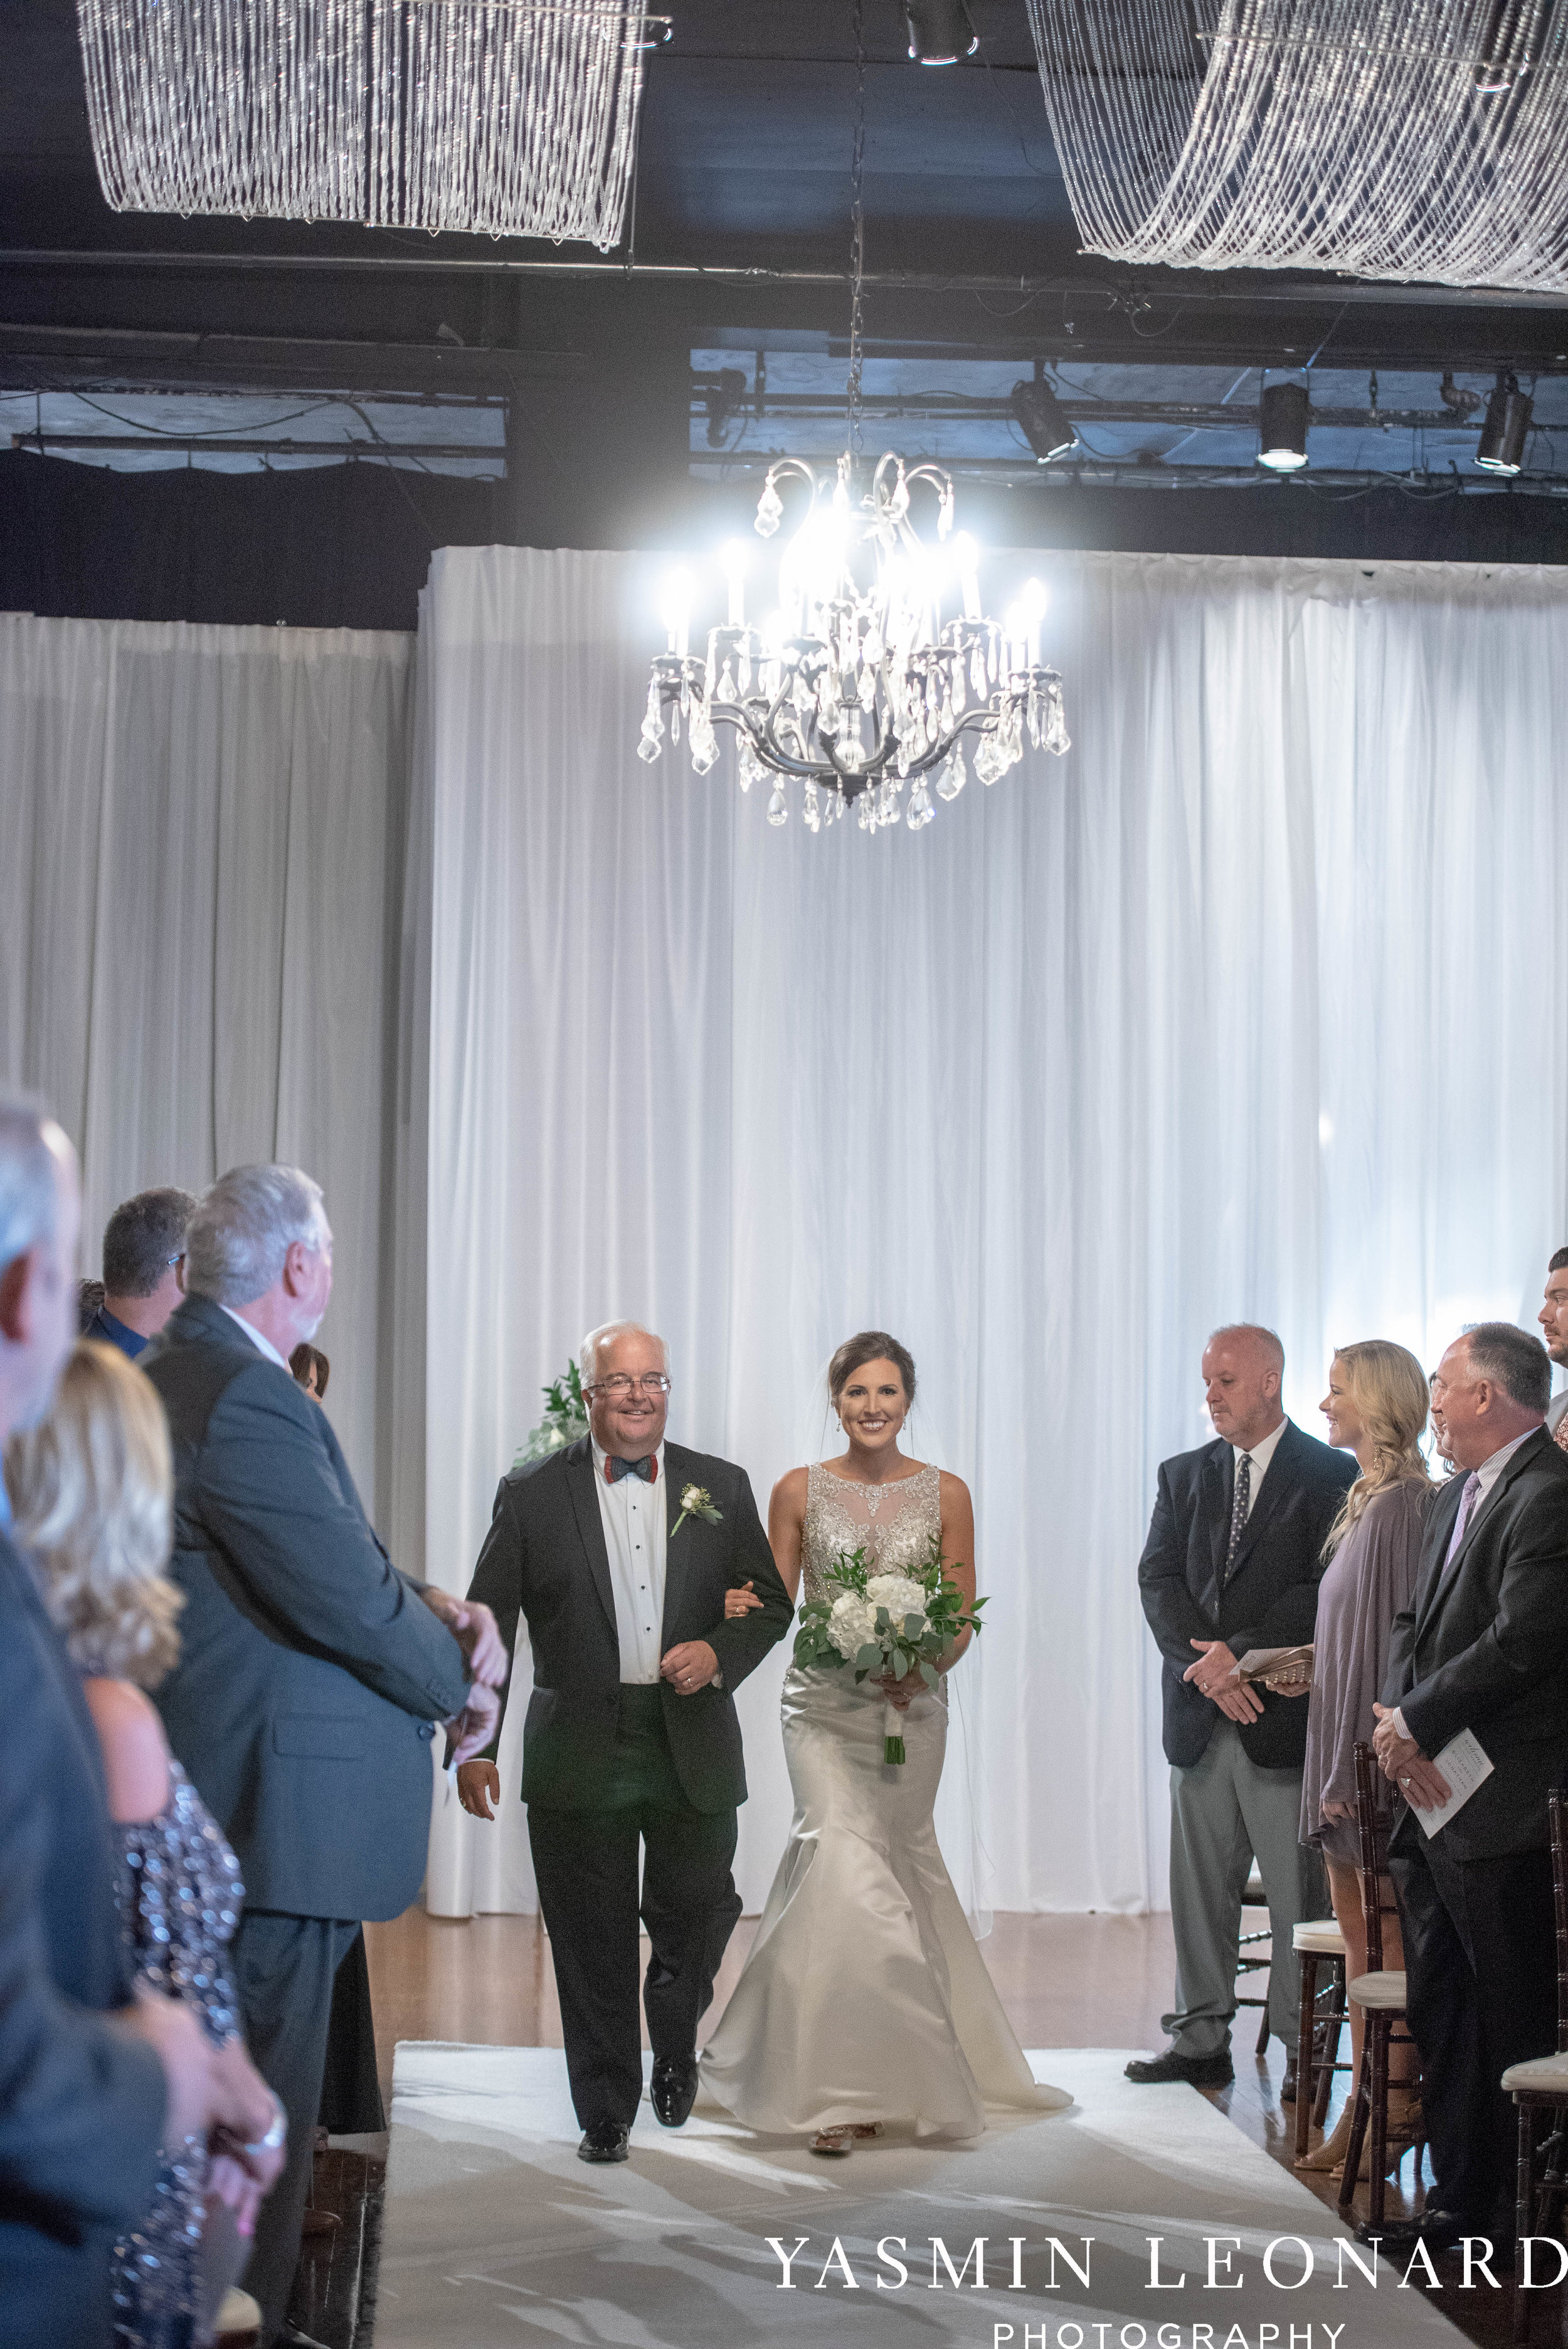 Millennium Center Wedding - Downtown Winston Salem - Winston Salem Wedding Photographer - Winston Salem Venues - Indoor Wedding Venues - NC Wedding Photographer - Yasmin Leonard Photography-35.jpg